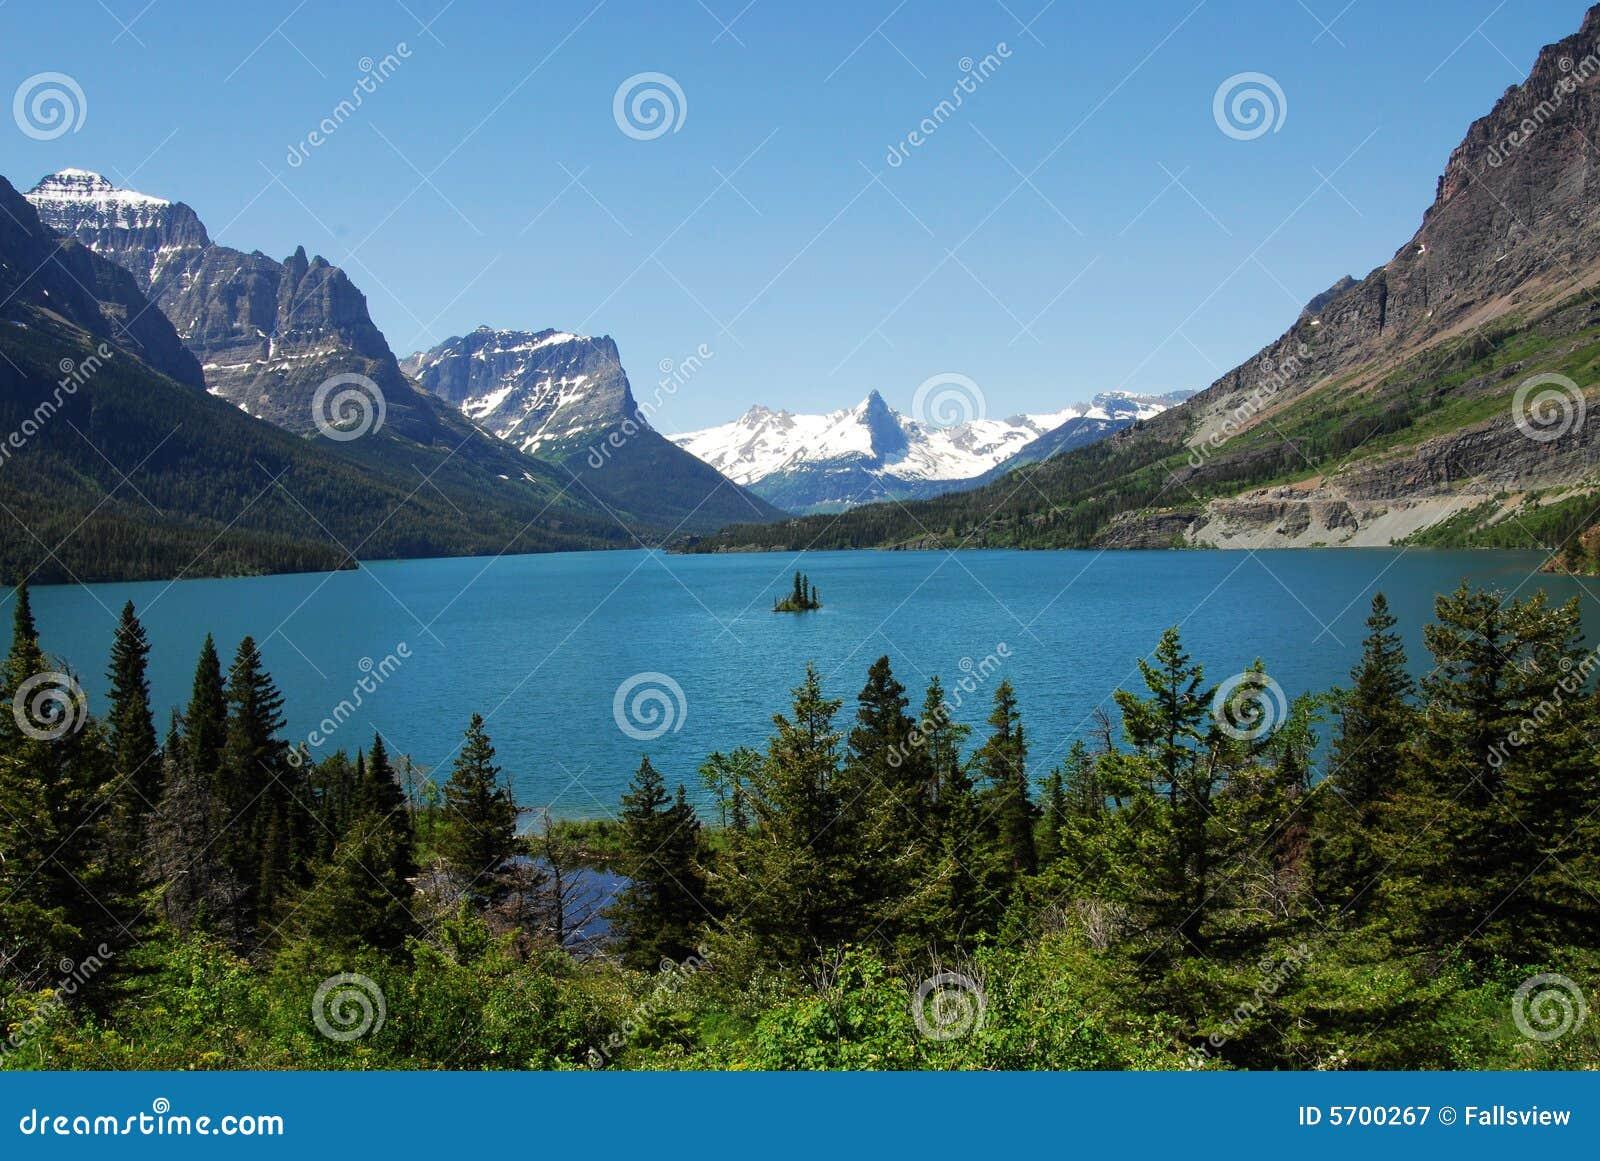 Mountain, lake and island